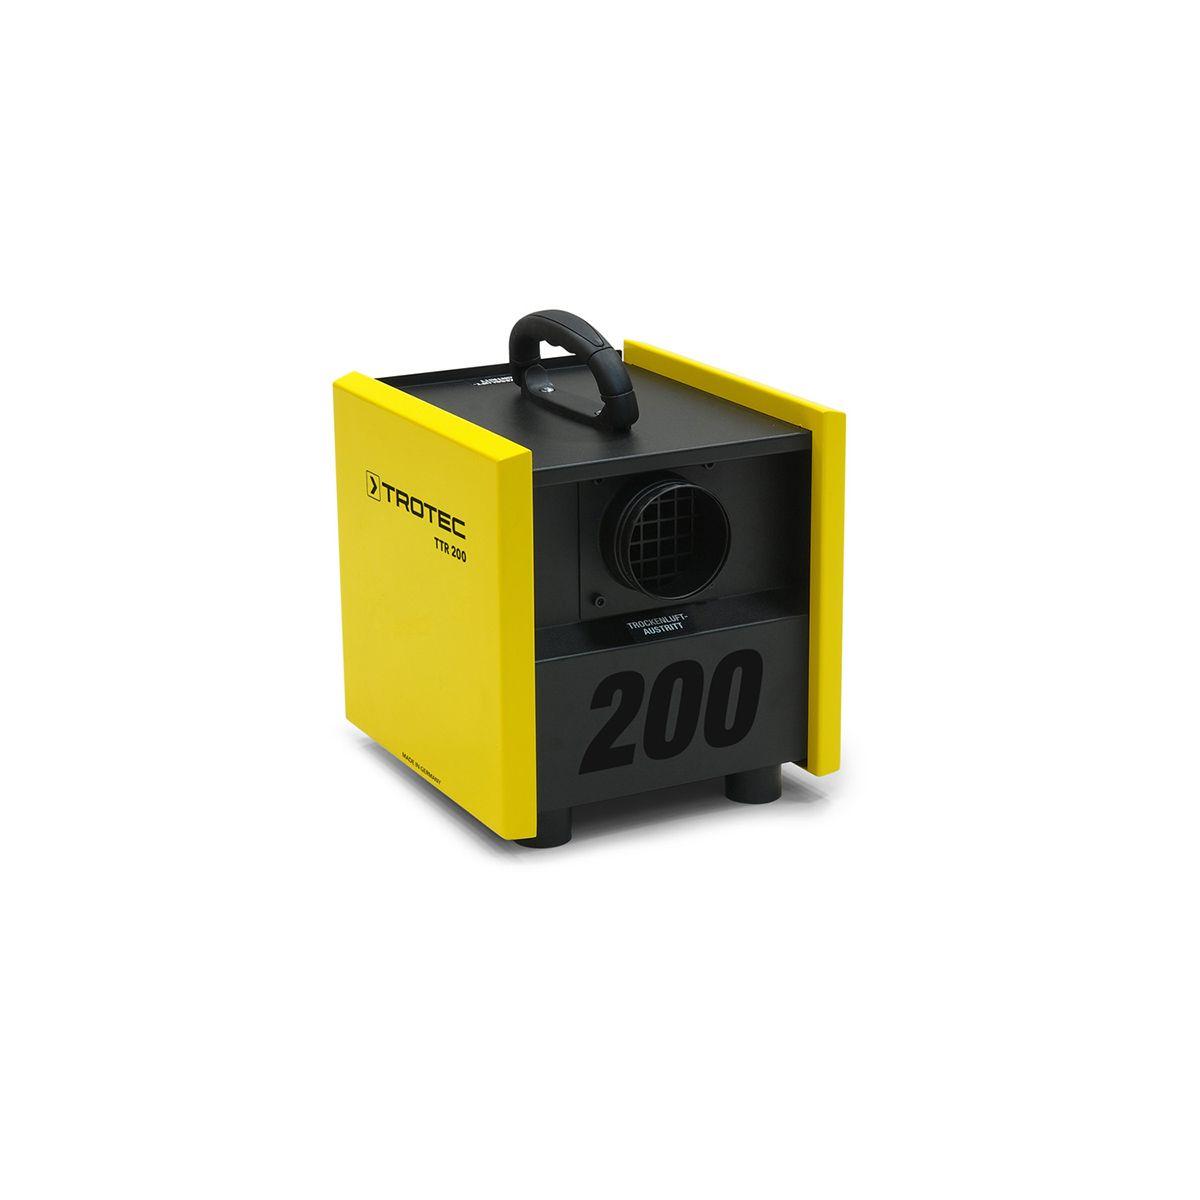 Adsorptionsluftentfeuchter, TTR 200, gelb/schwarz, 230 V, 0.45 kW, 80 m3/h, 0.25 kg/h